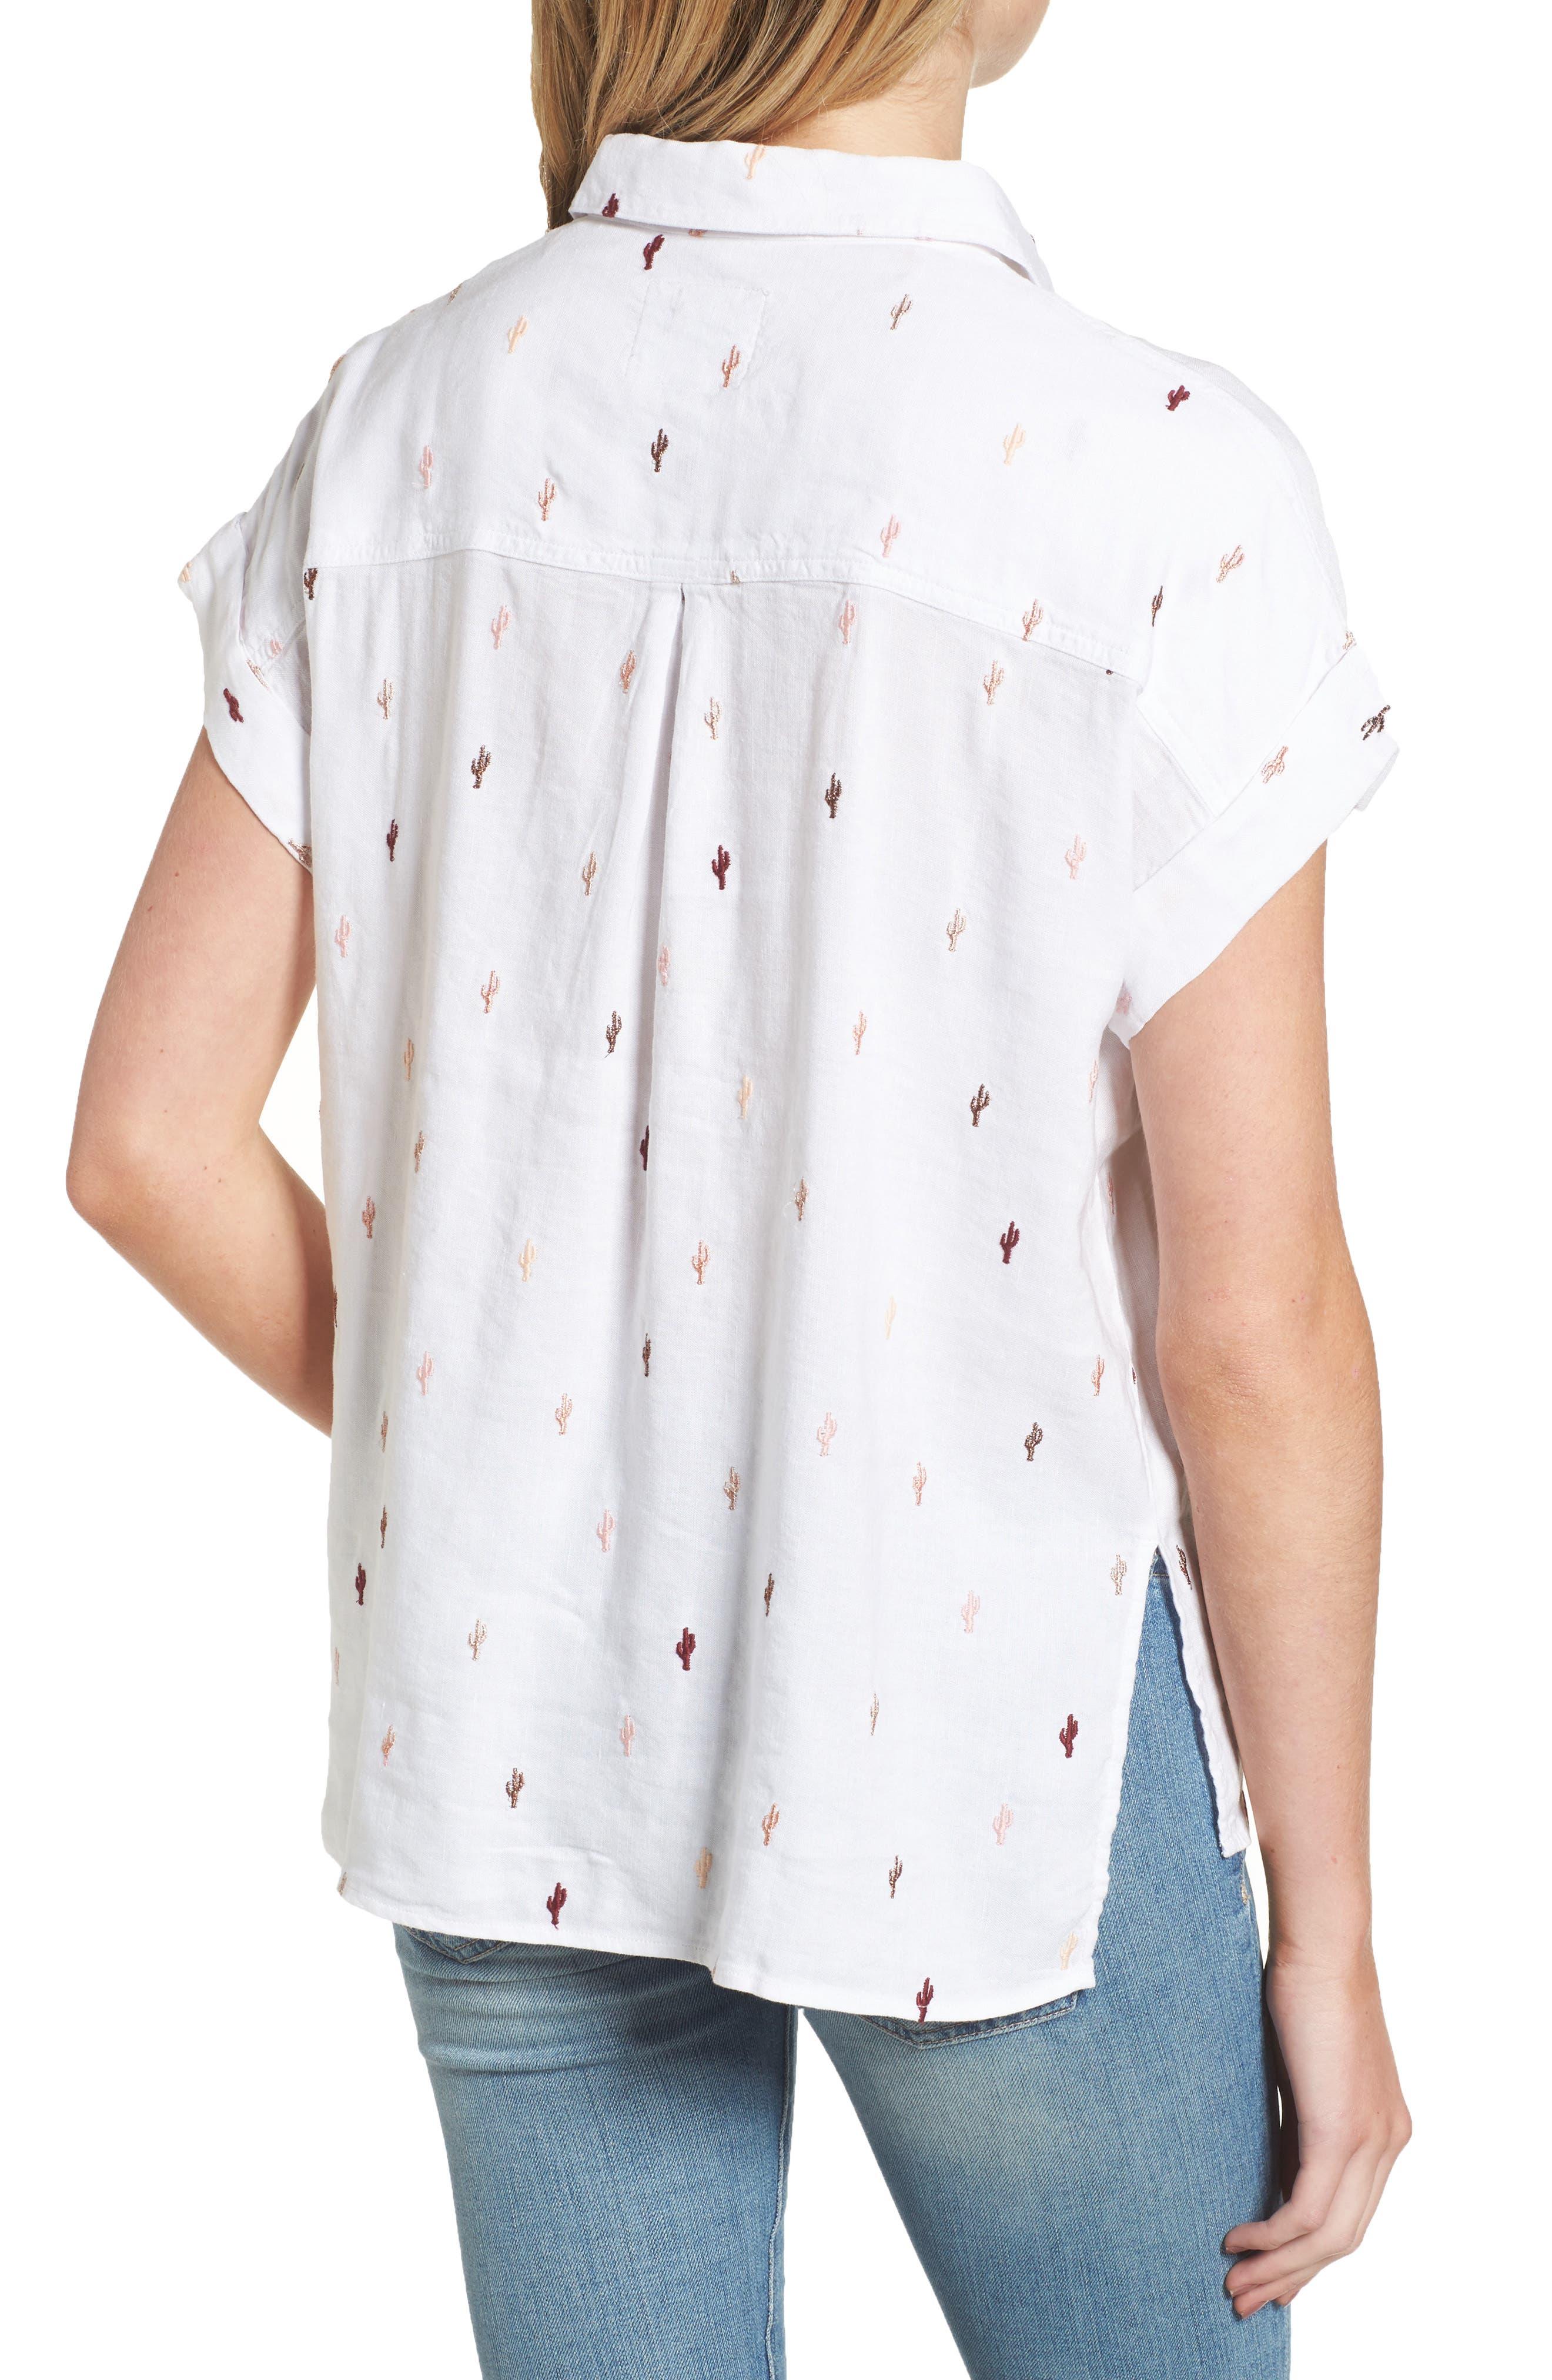 Whitney Cactus Print Shirt,                             Alternate thumbnail 2, color,                             METALLIC CACTUS